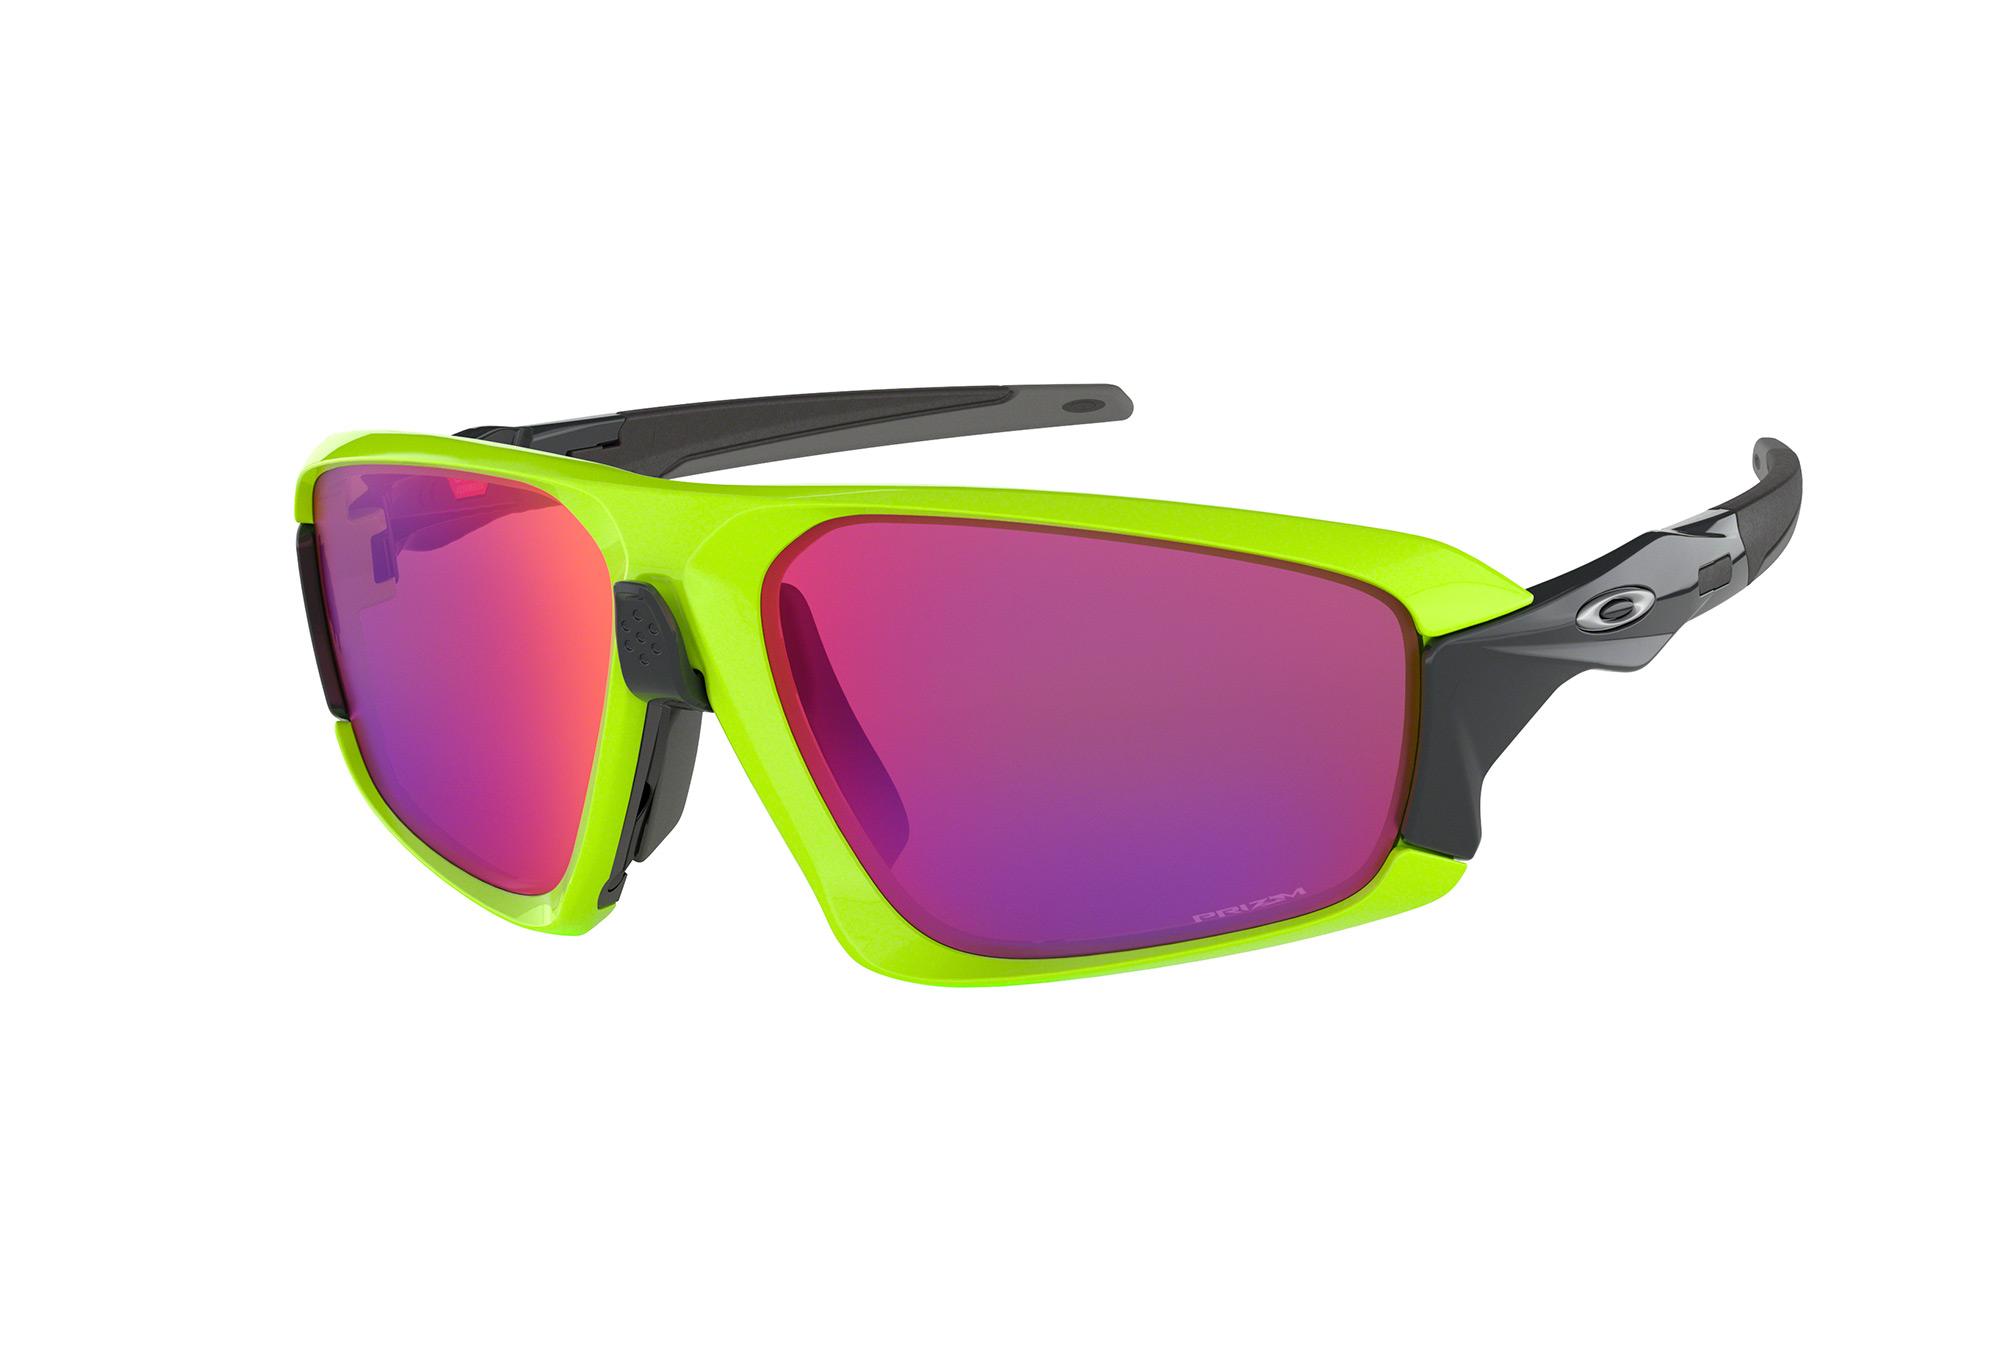 2cb36c1d05392 OAKLEY Field Jacket Sunglasses Neon Yellow Black Prizm Road ...